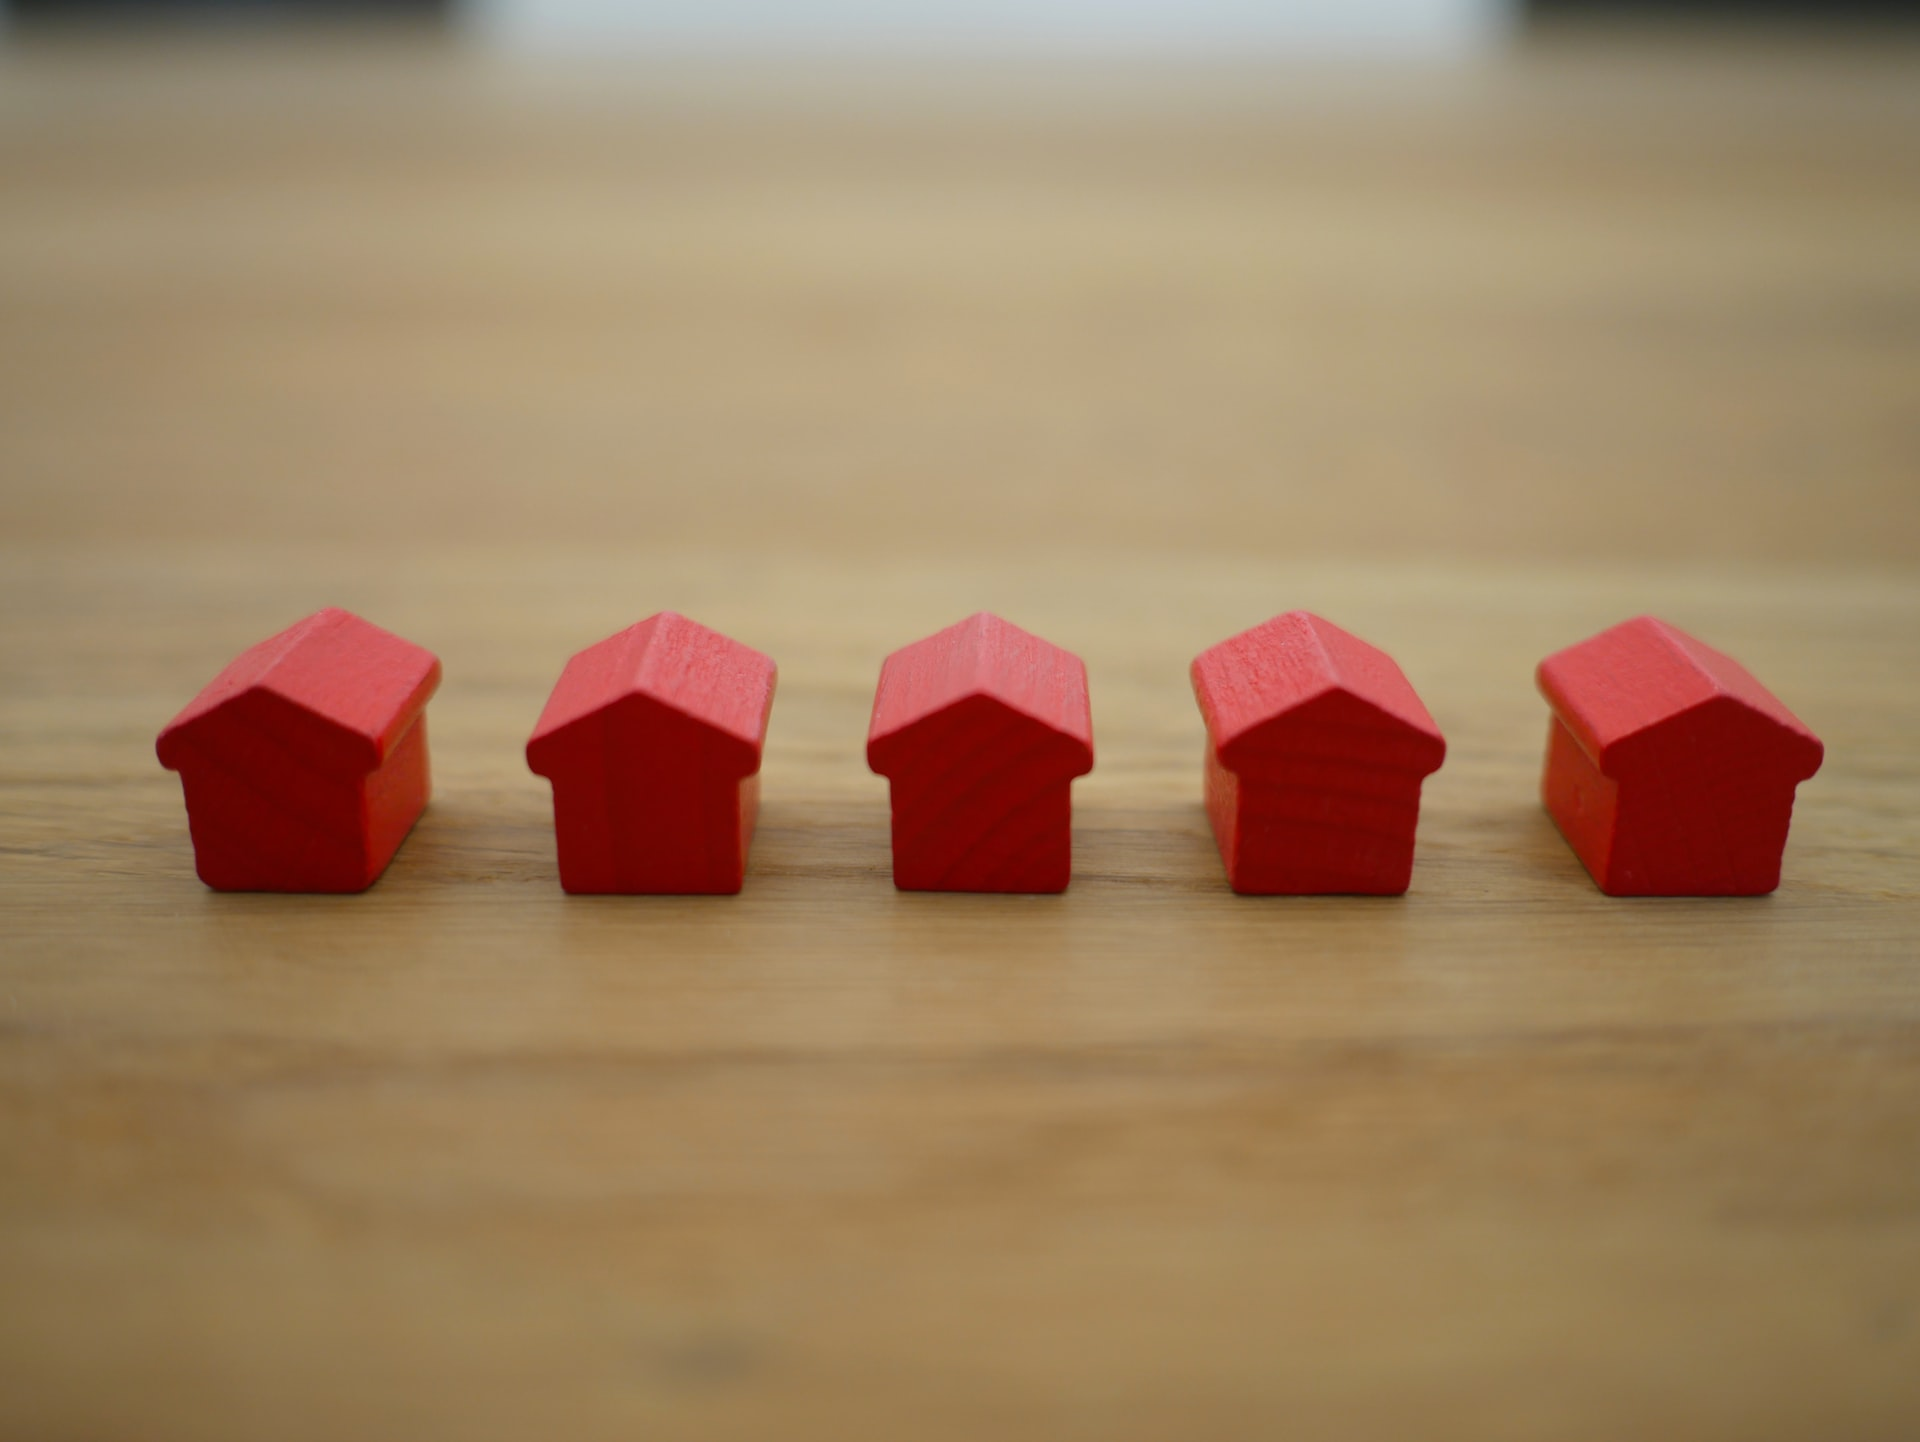 LOA immobilier